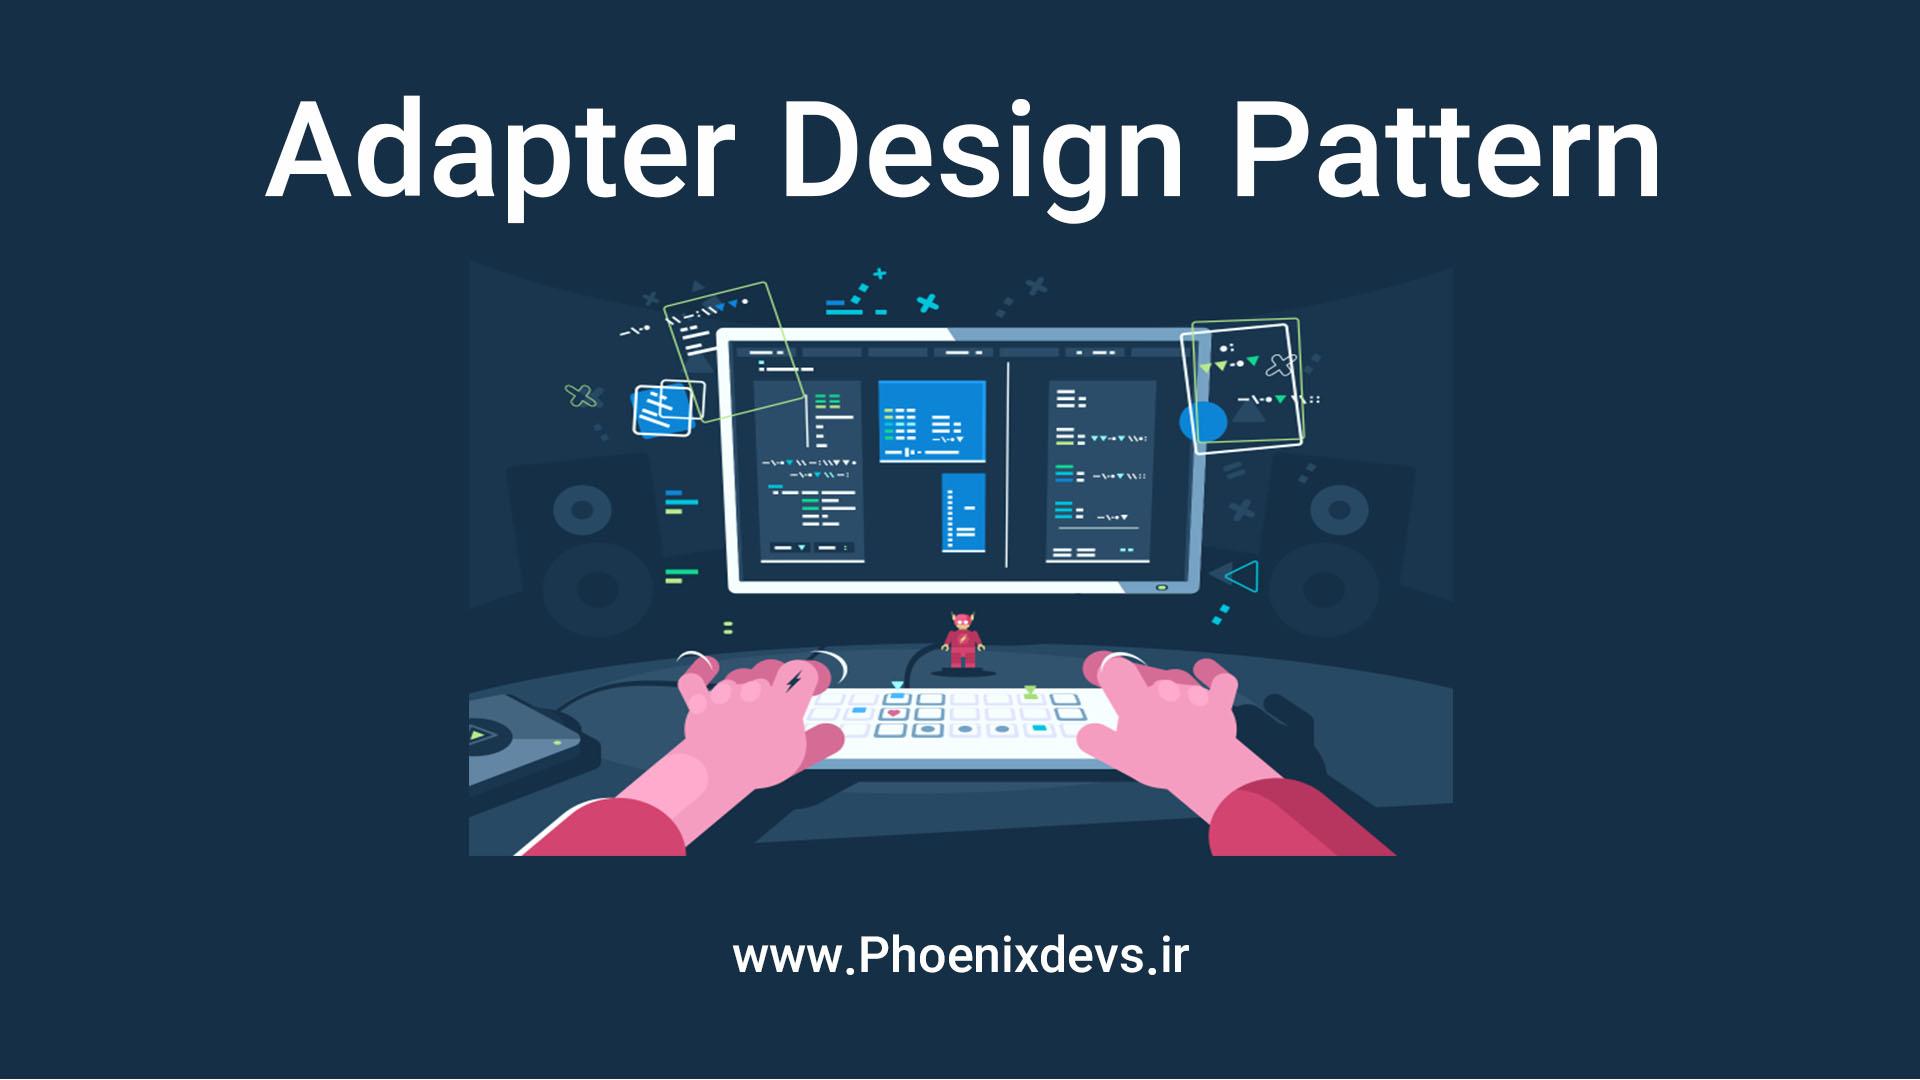 دیزاین پترن Adapter